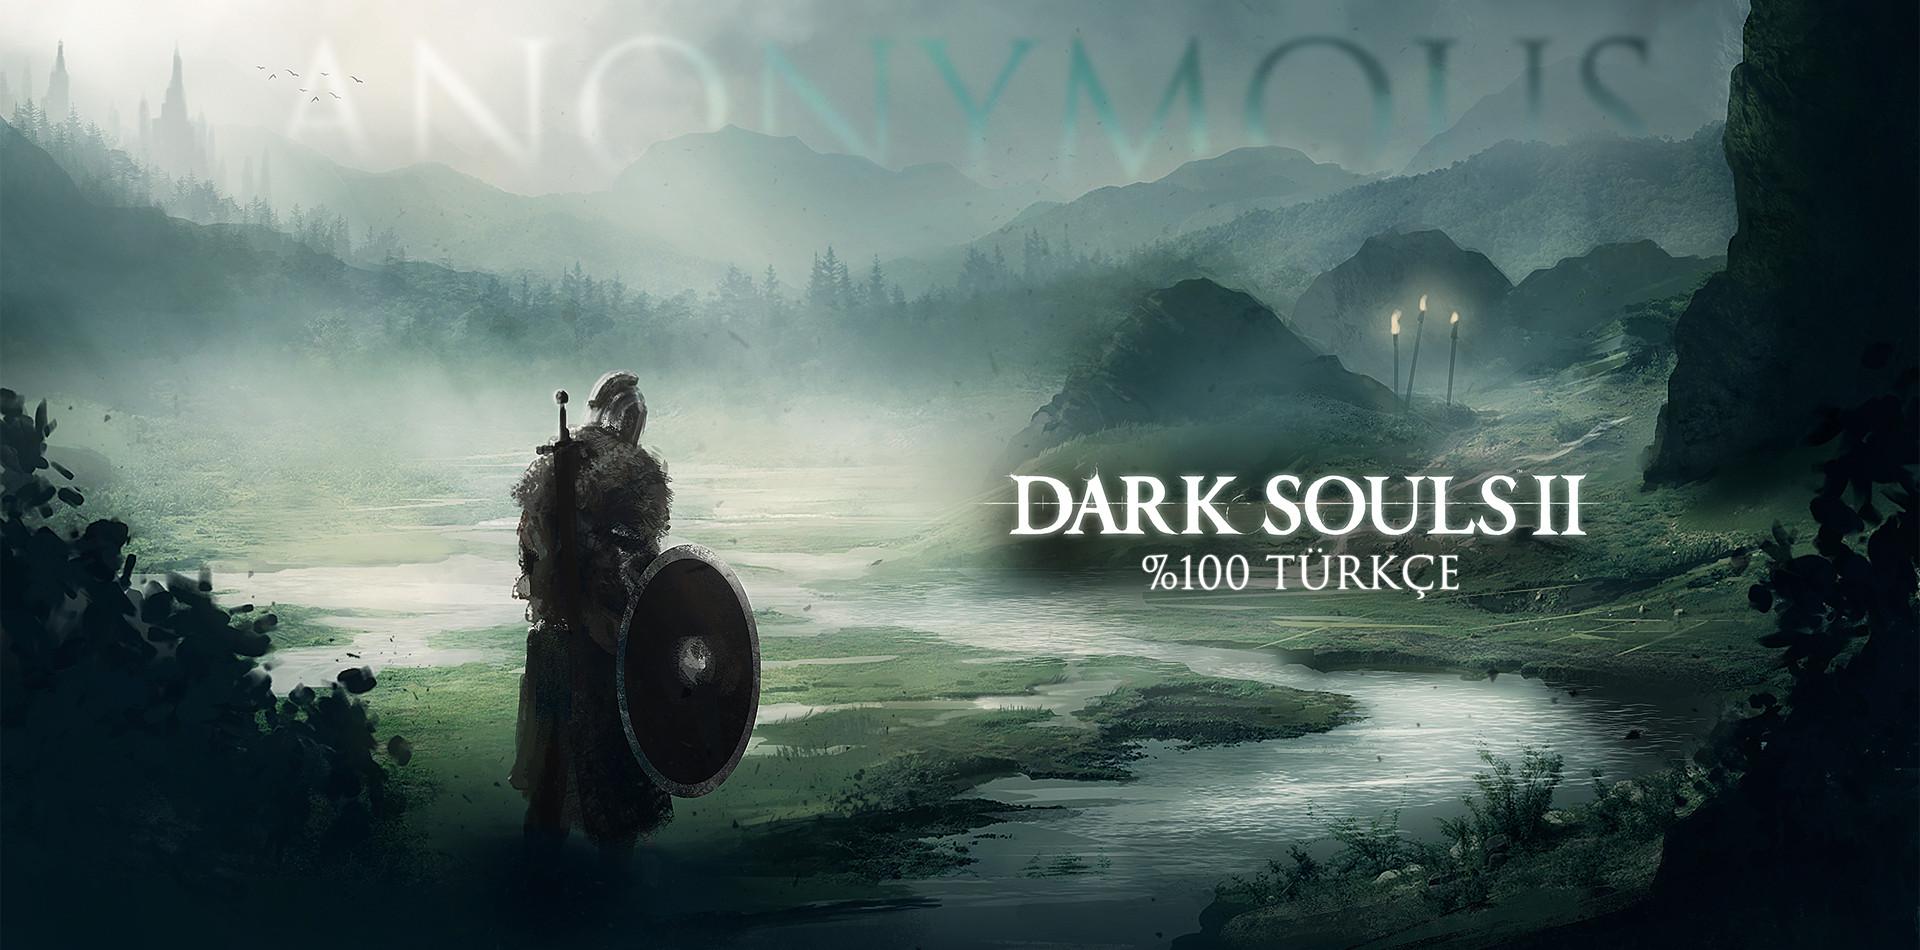 darksoulsii1080.jpg